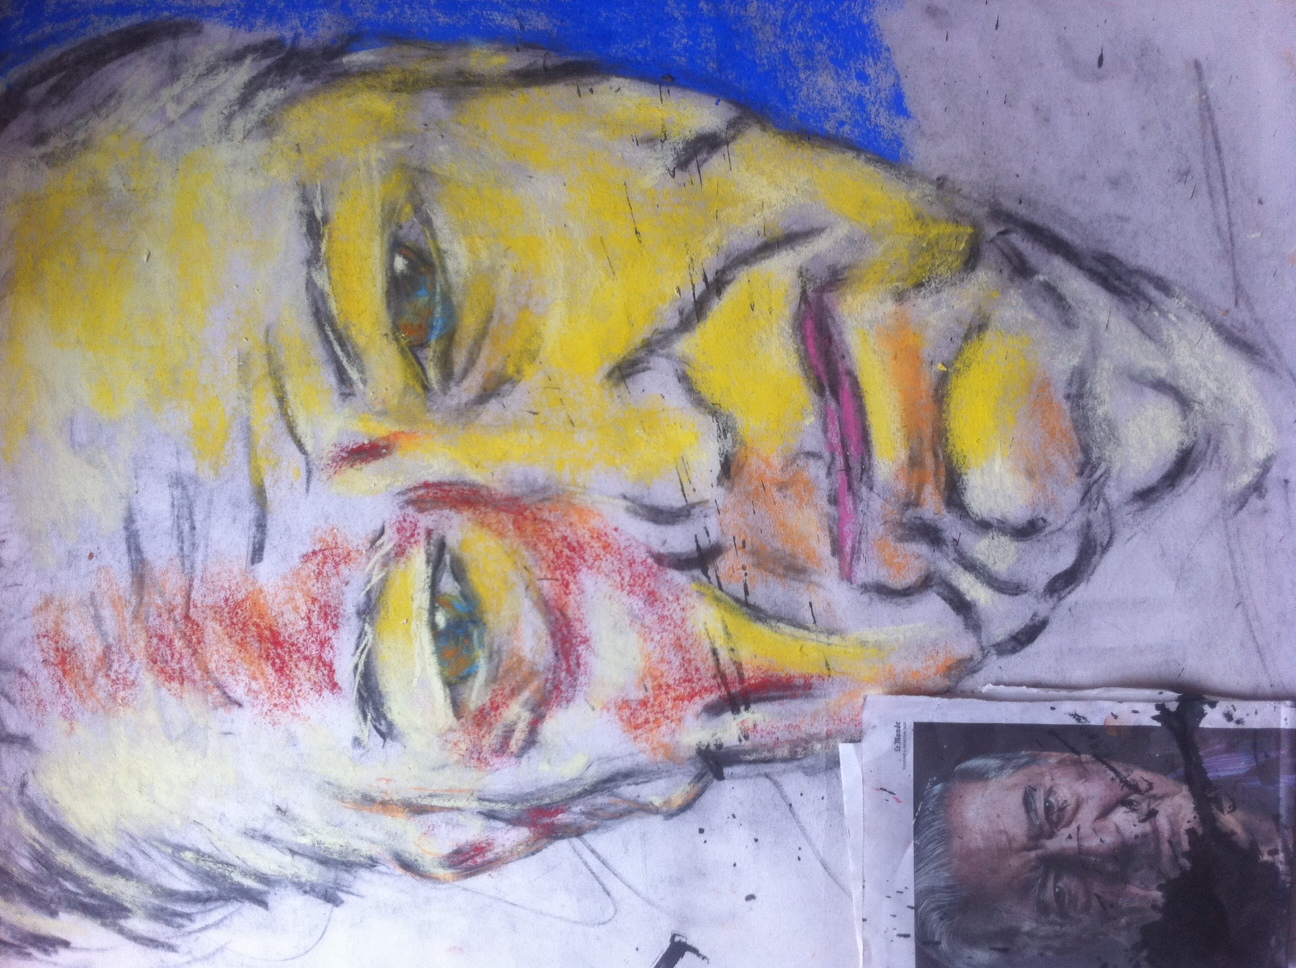 Foto 14-02-2012 04 30 51.jpg